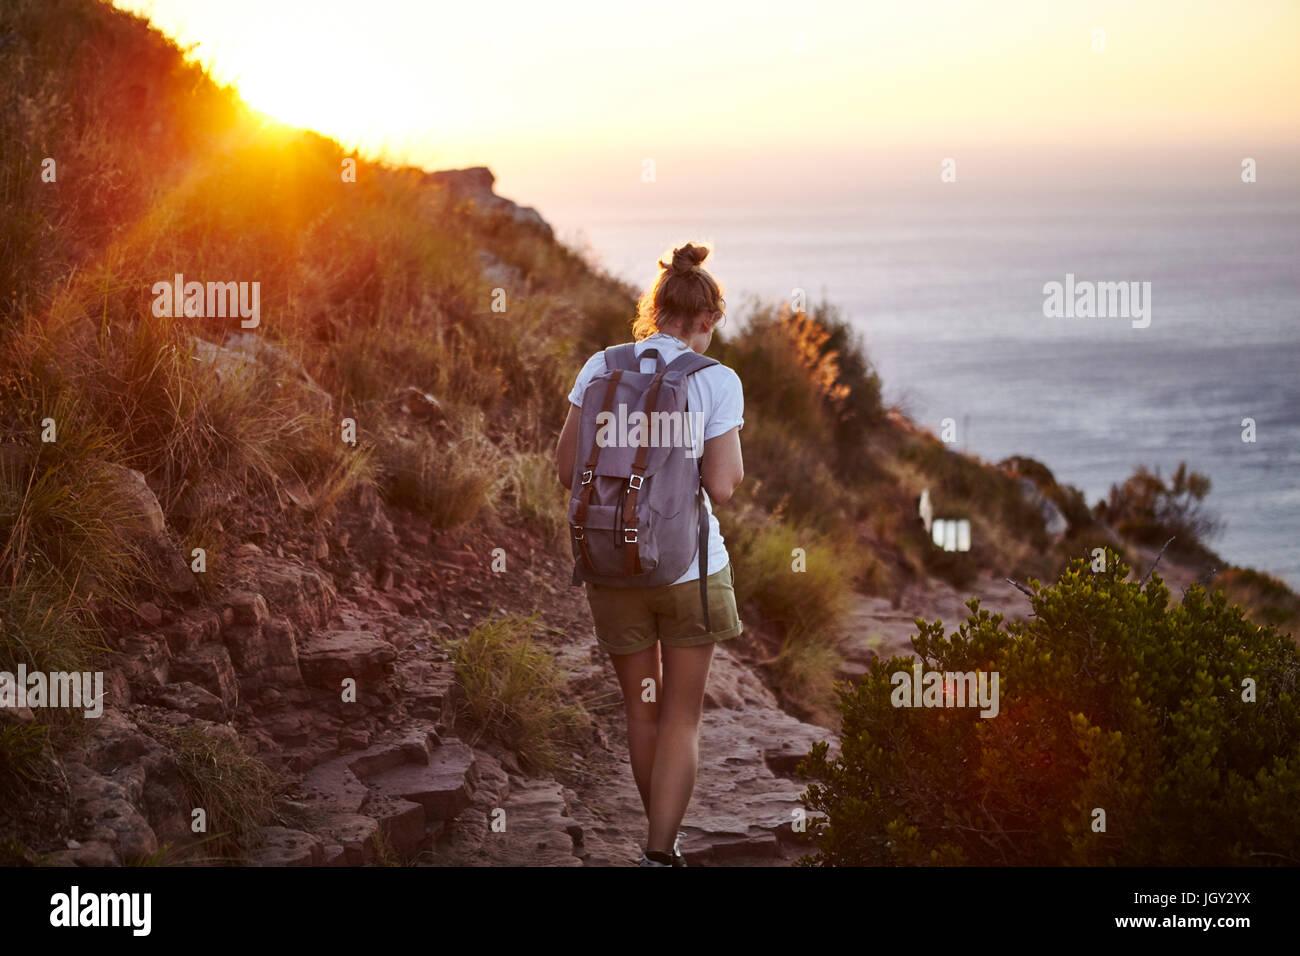 Mujer joven senderismo, vista trasera, Lions Head Mountain, Western Cape, Ciudad del Cabo, Sudáfrica Imagen De Stock